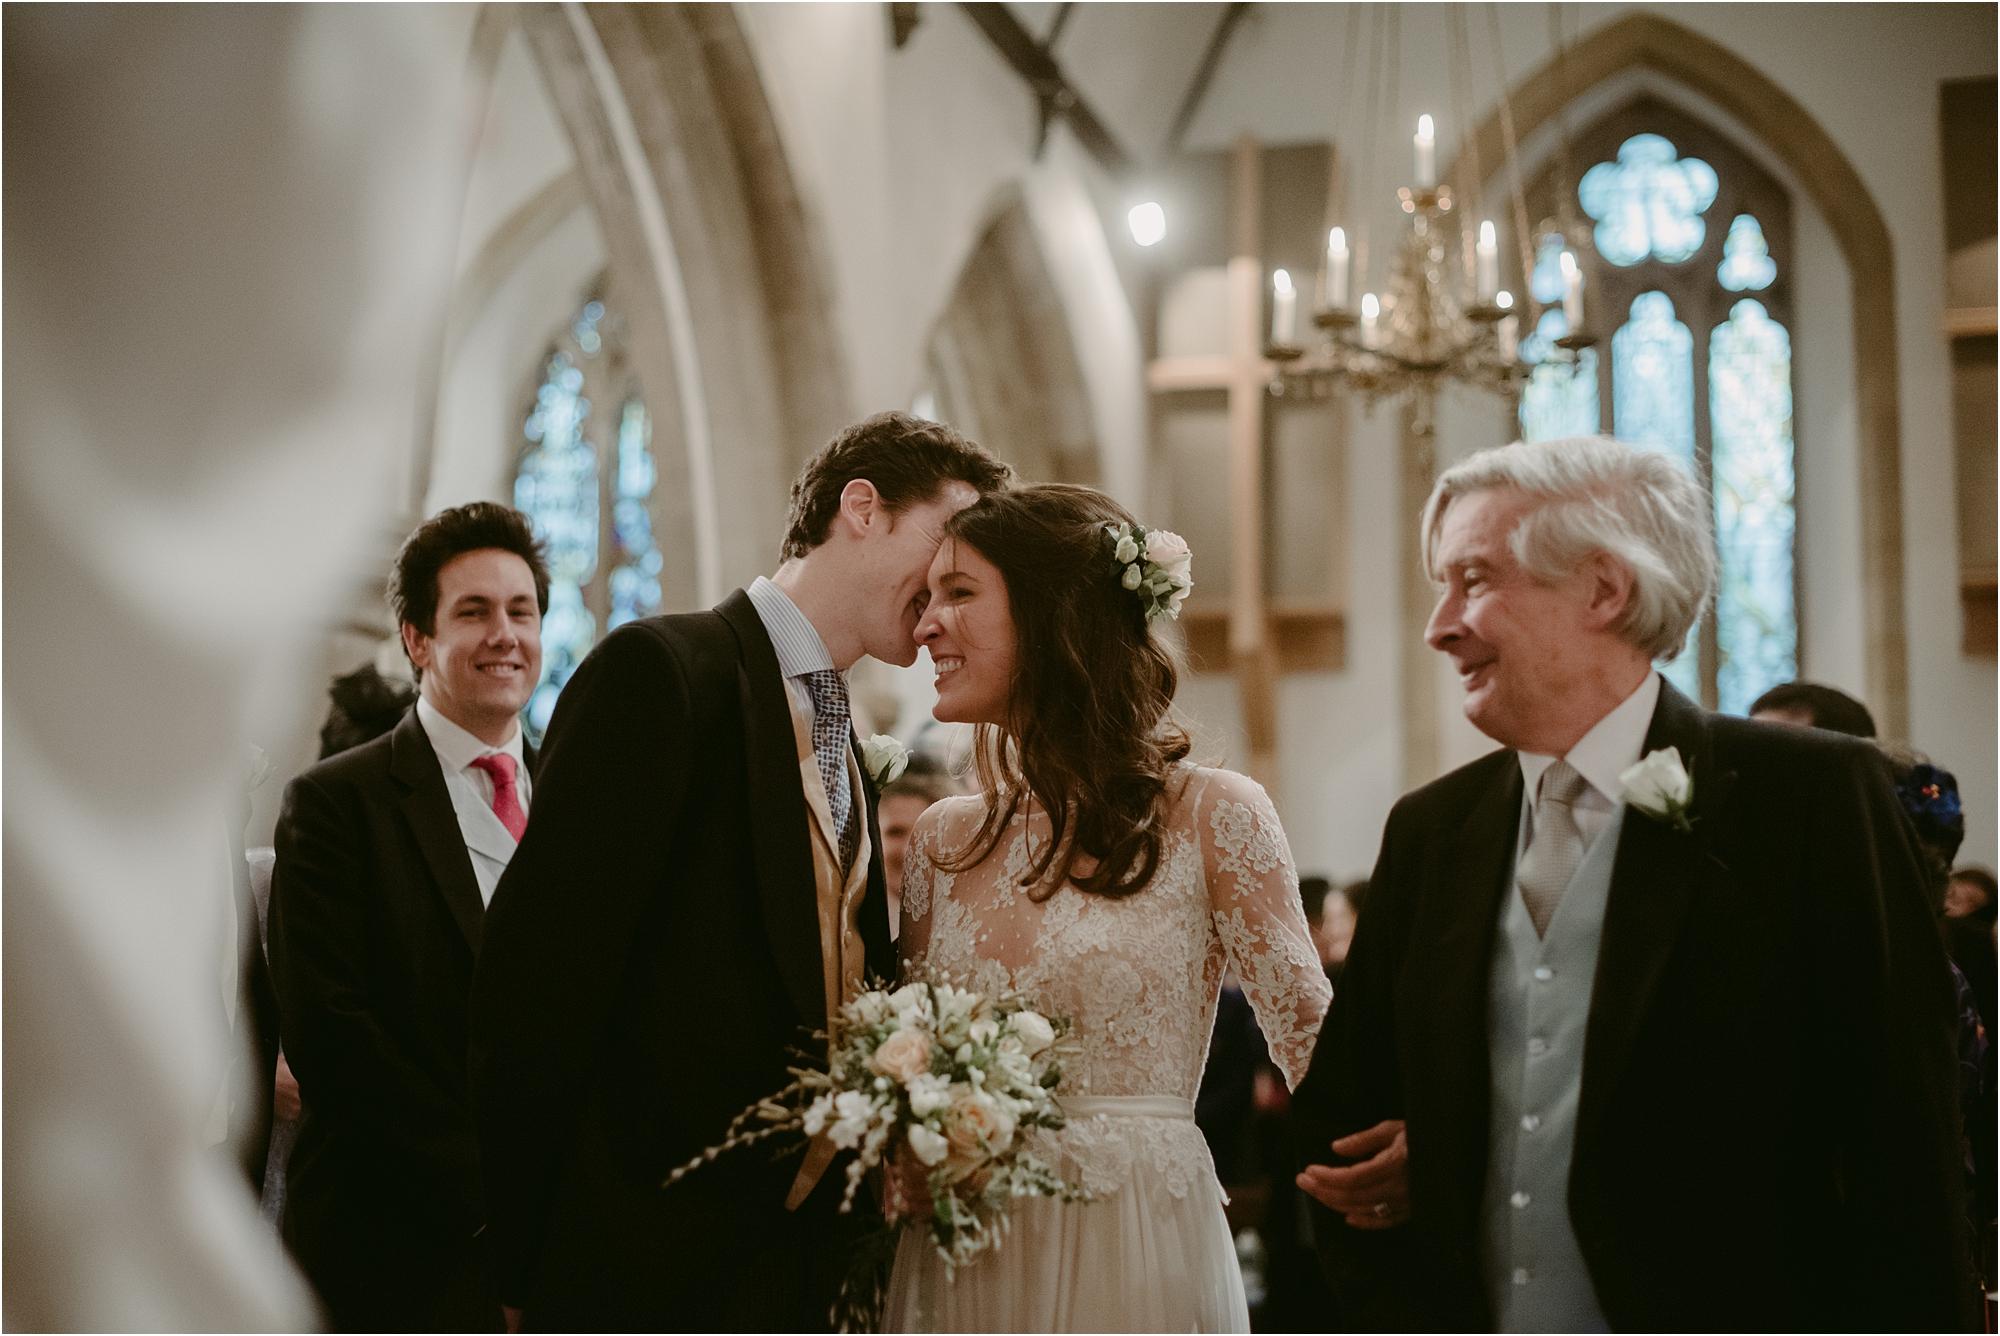 Rose+Harry-outdoor-english-wedding-photography__0050.jpg